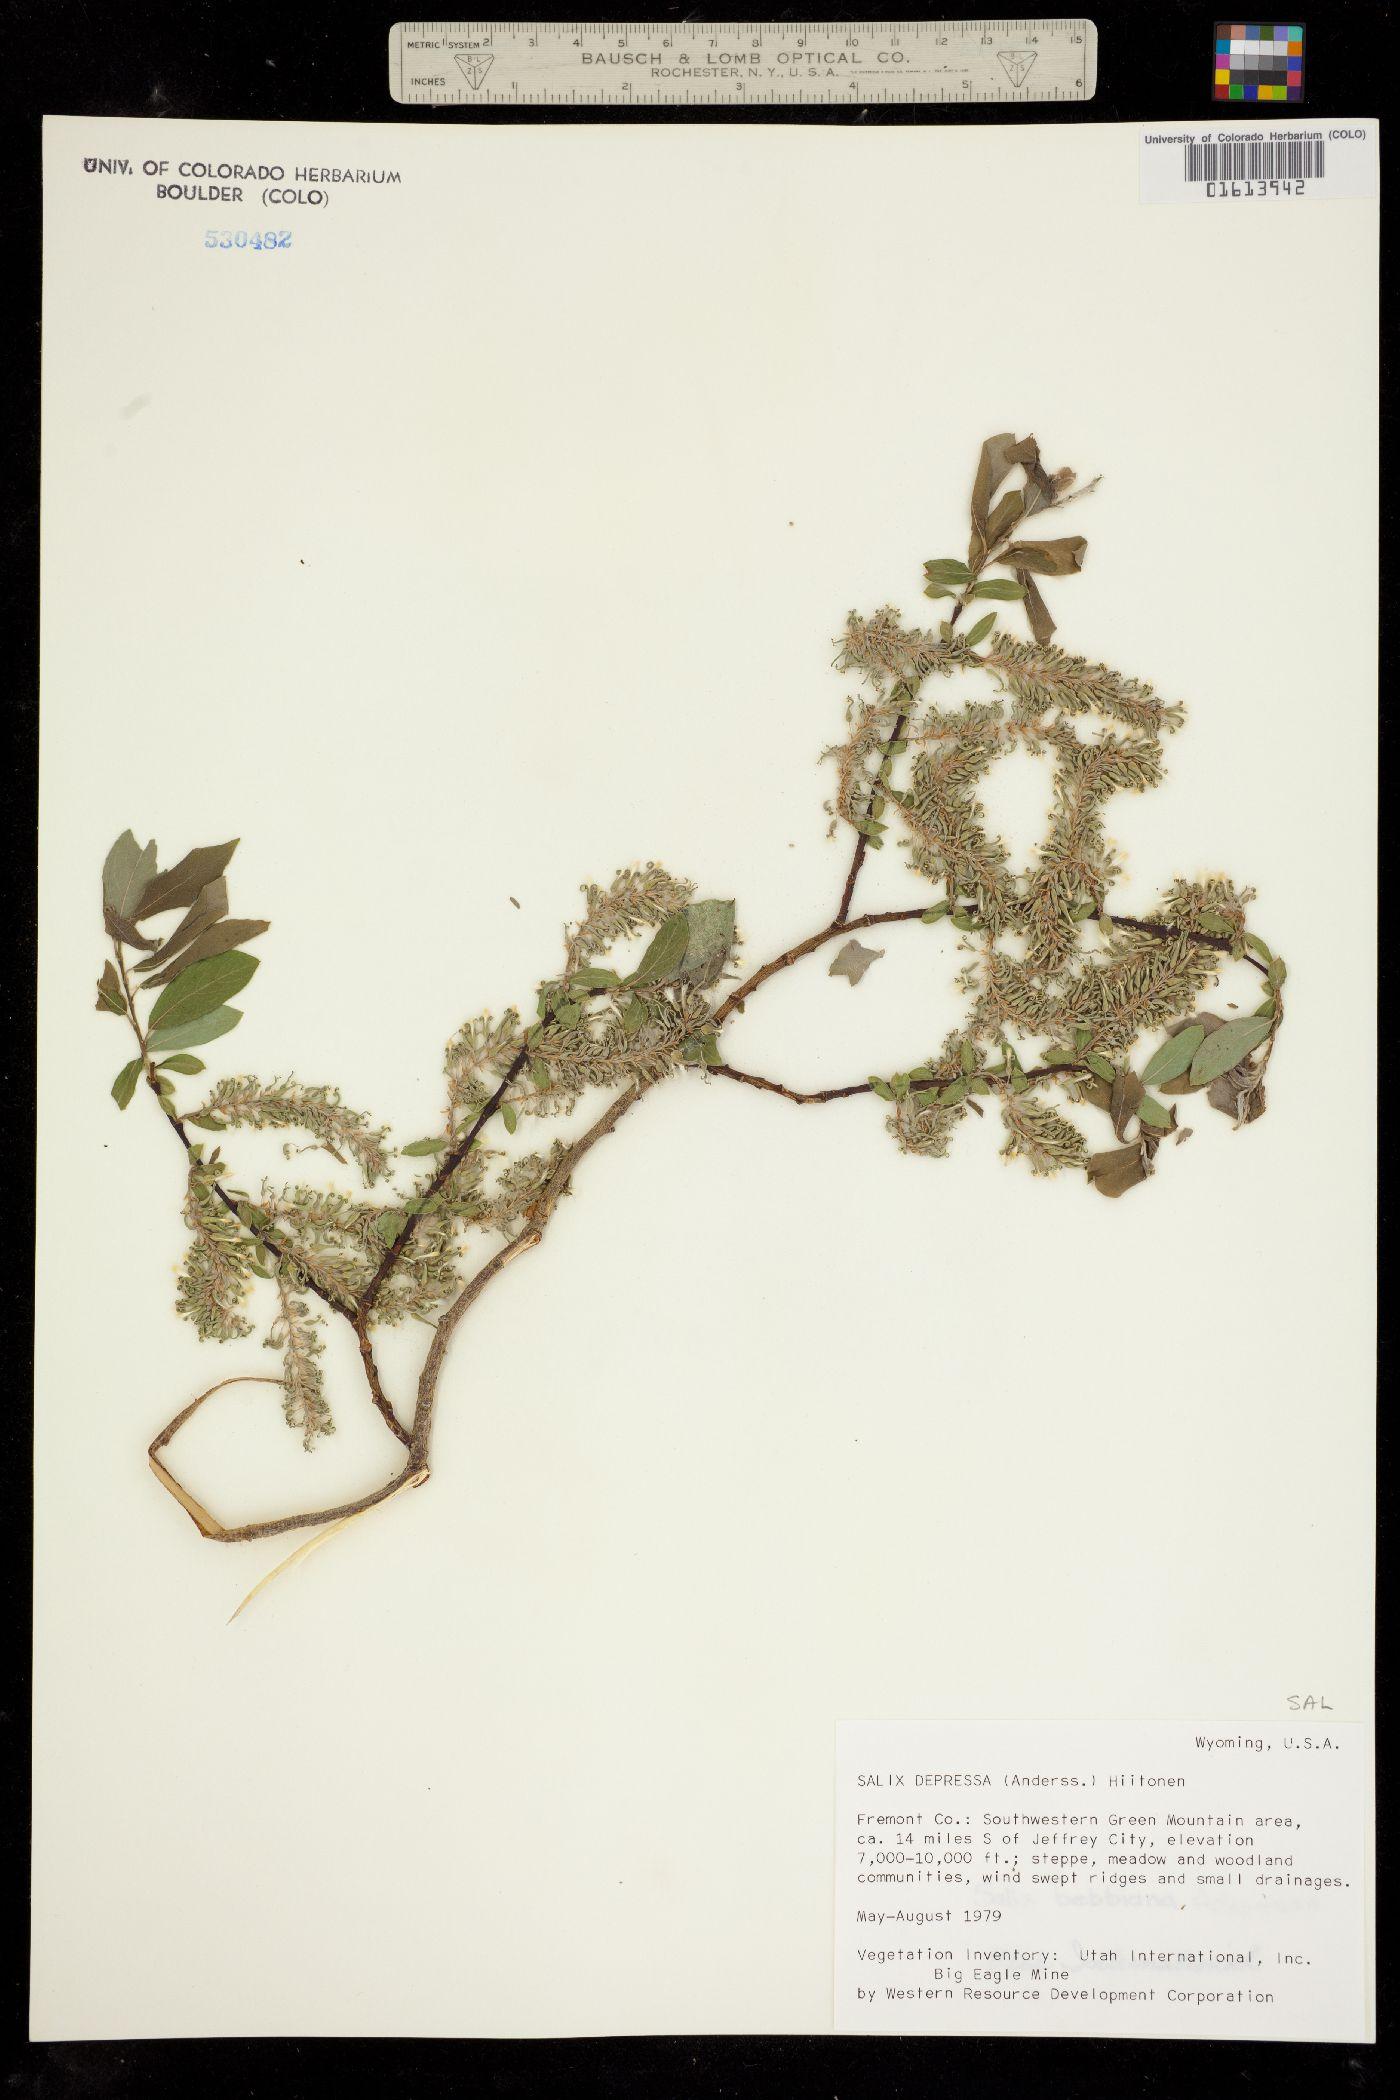 Salix depressa image